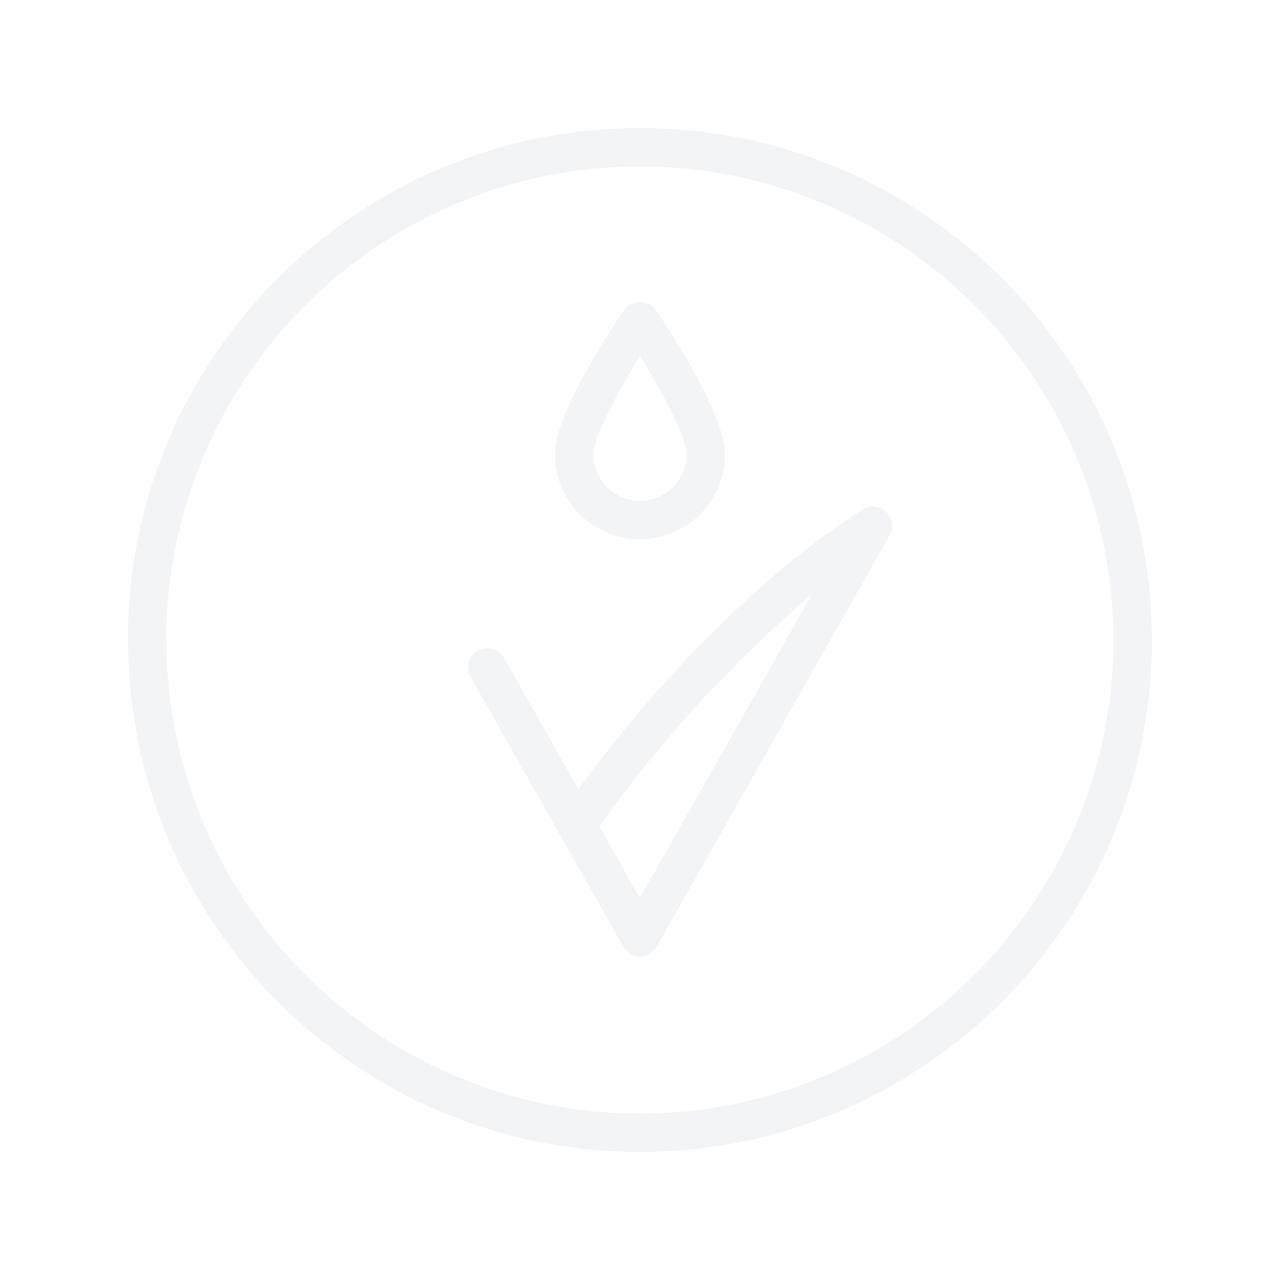 MAKEUP REVOLUTION Highlighting Powder Palette 15g